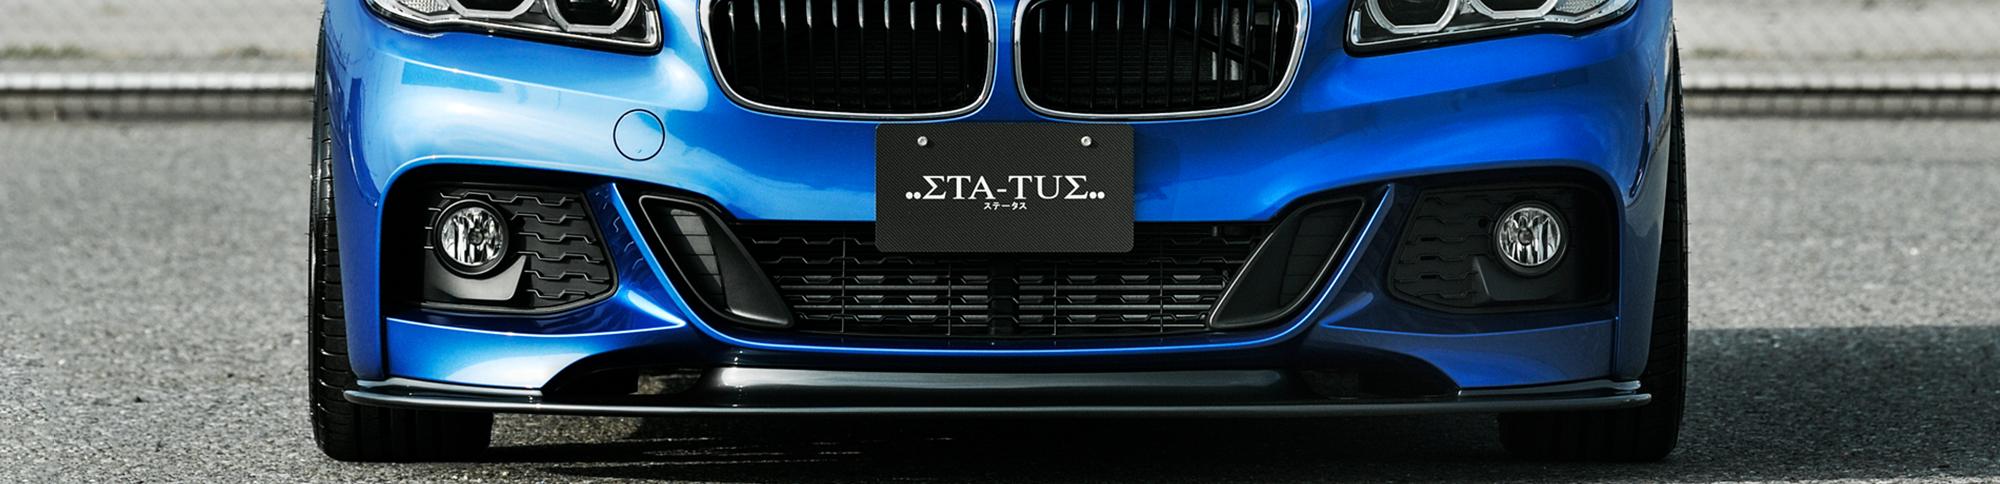 STA-TUS 青車両フロントアップ画像